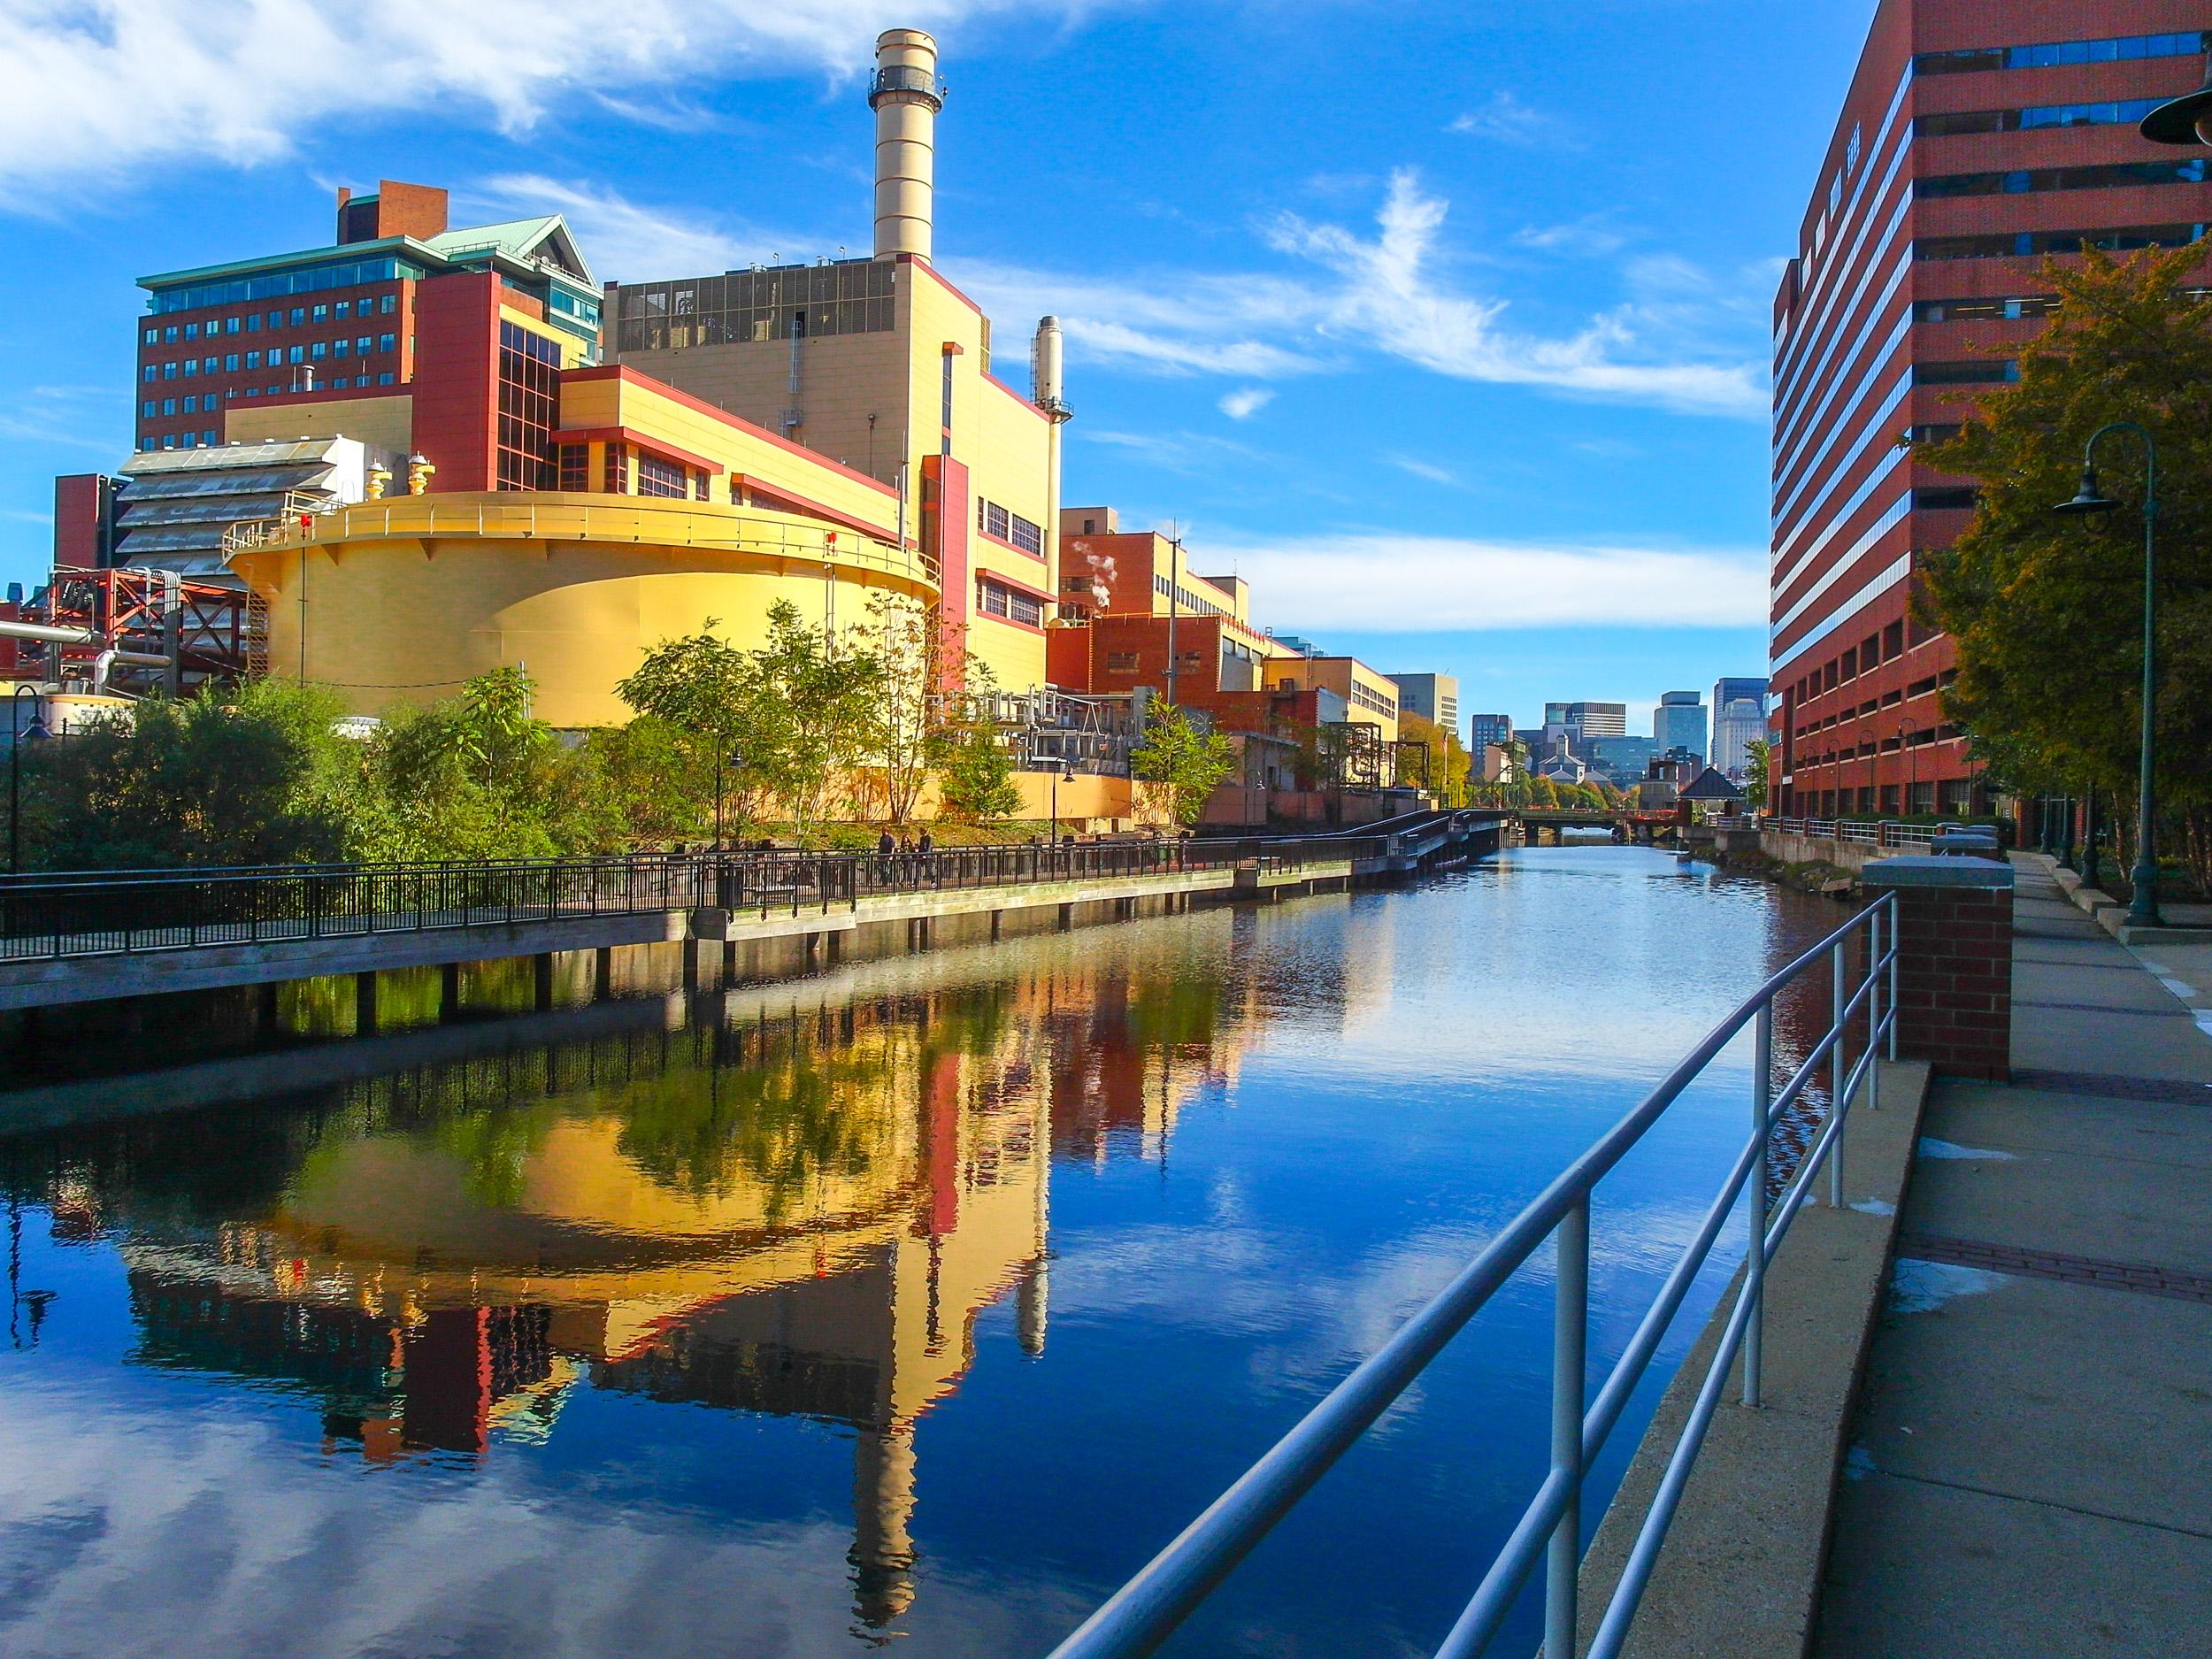 Broad Canal - Cambridge, MA